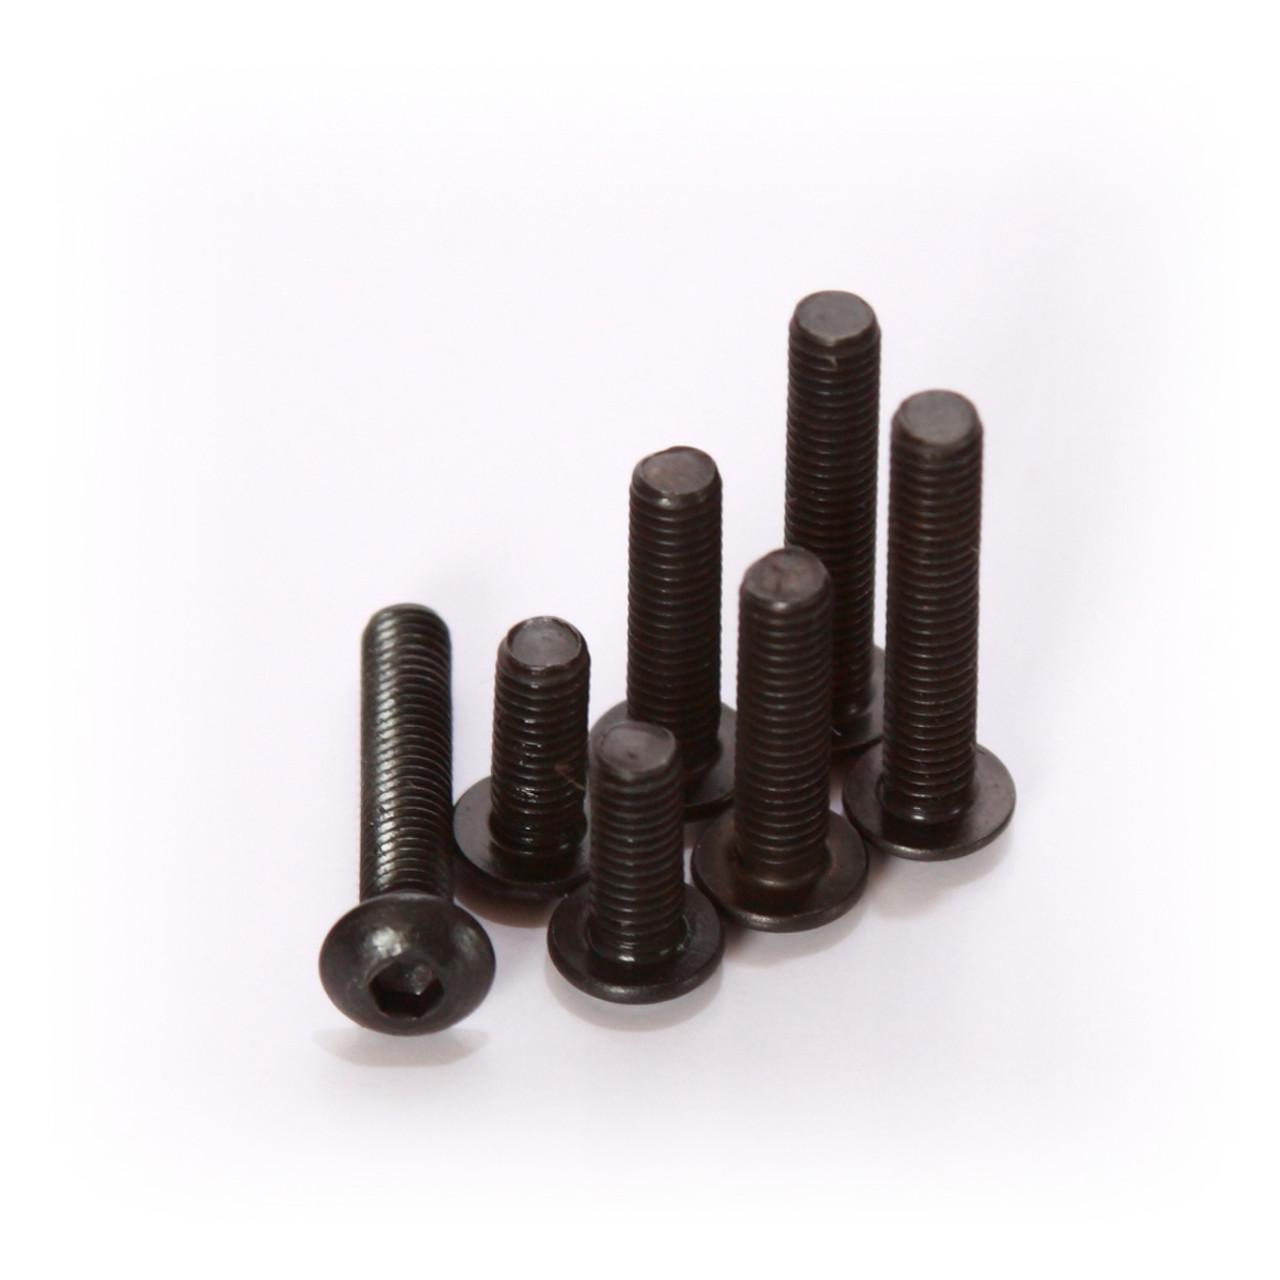 Hardware 4x6 mm BHSC Screws (10 Pack)